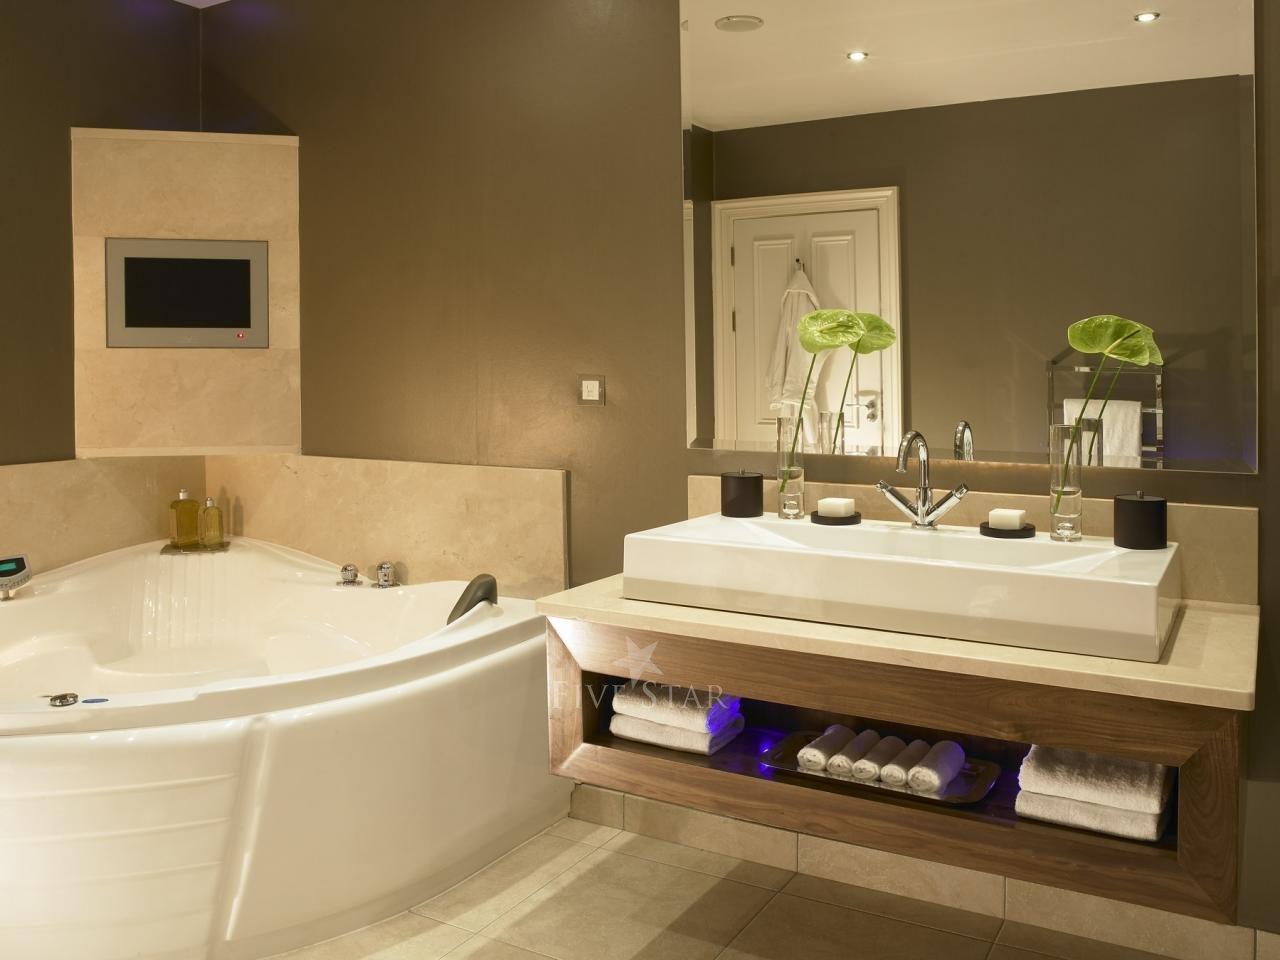 Muckross Park Hotel photo 26